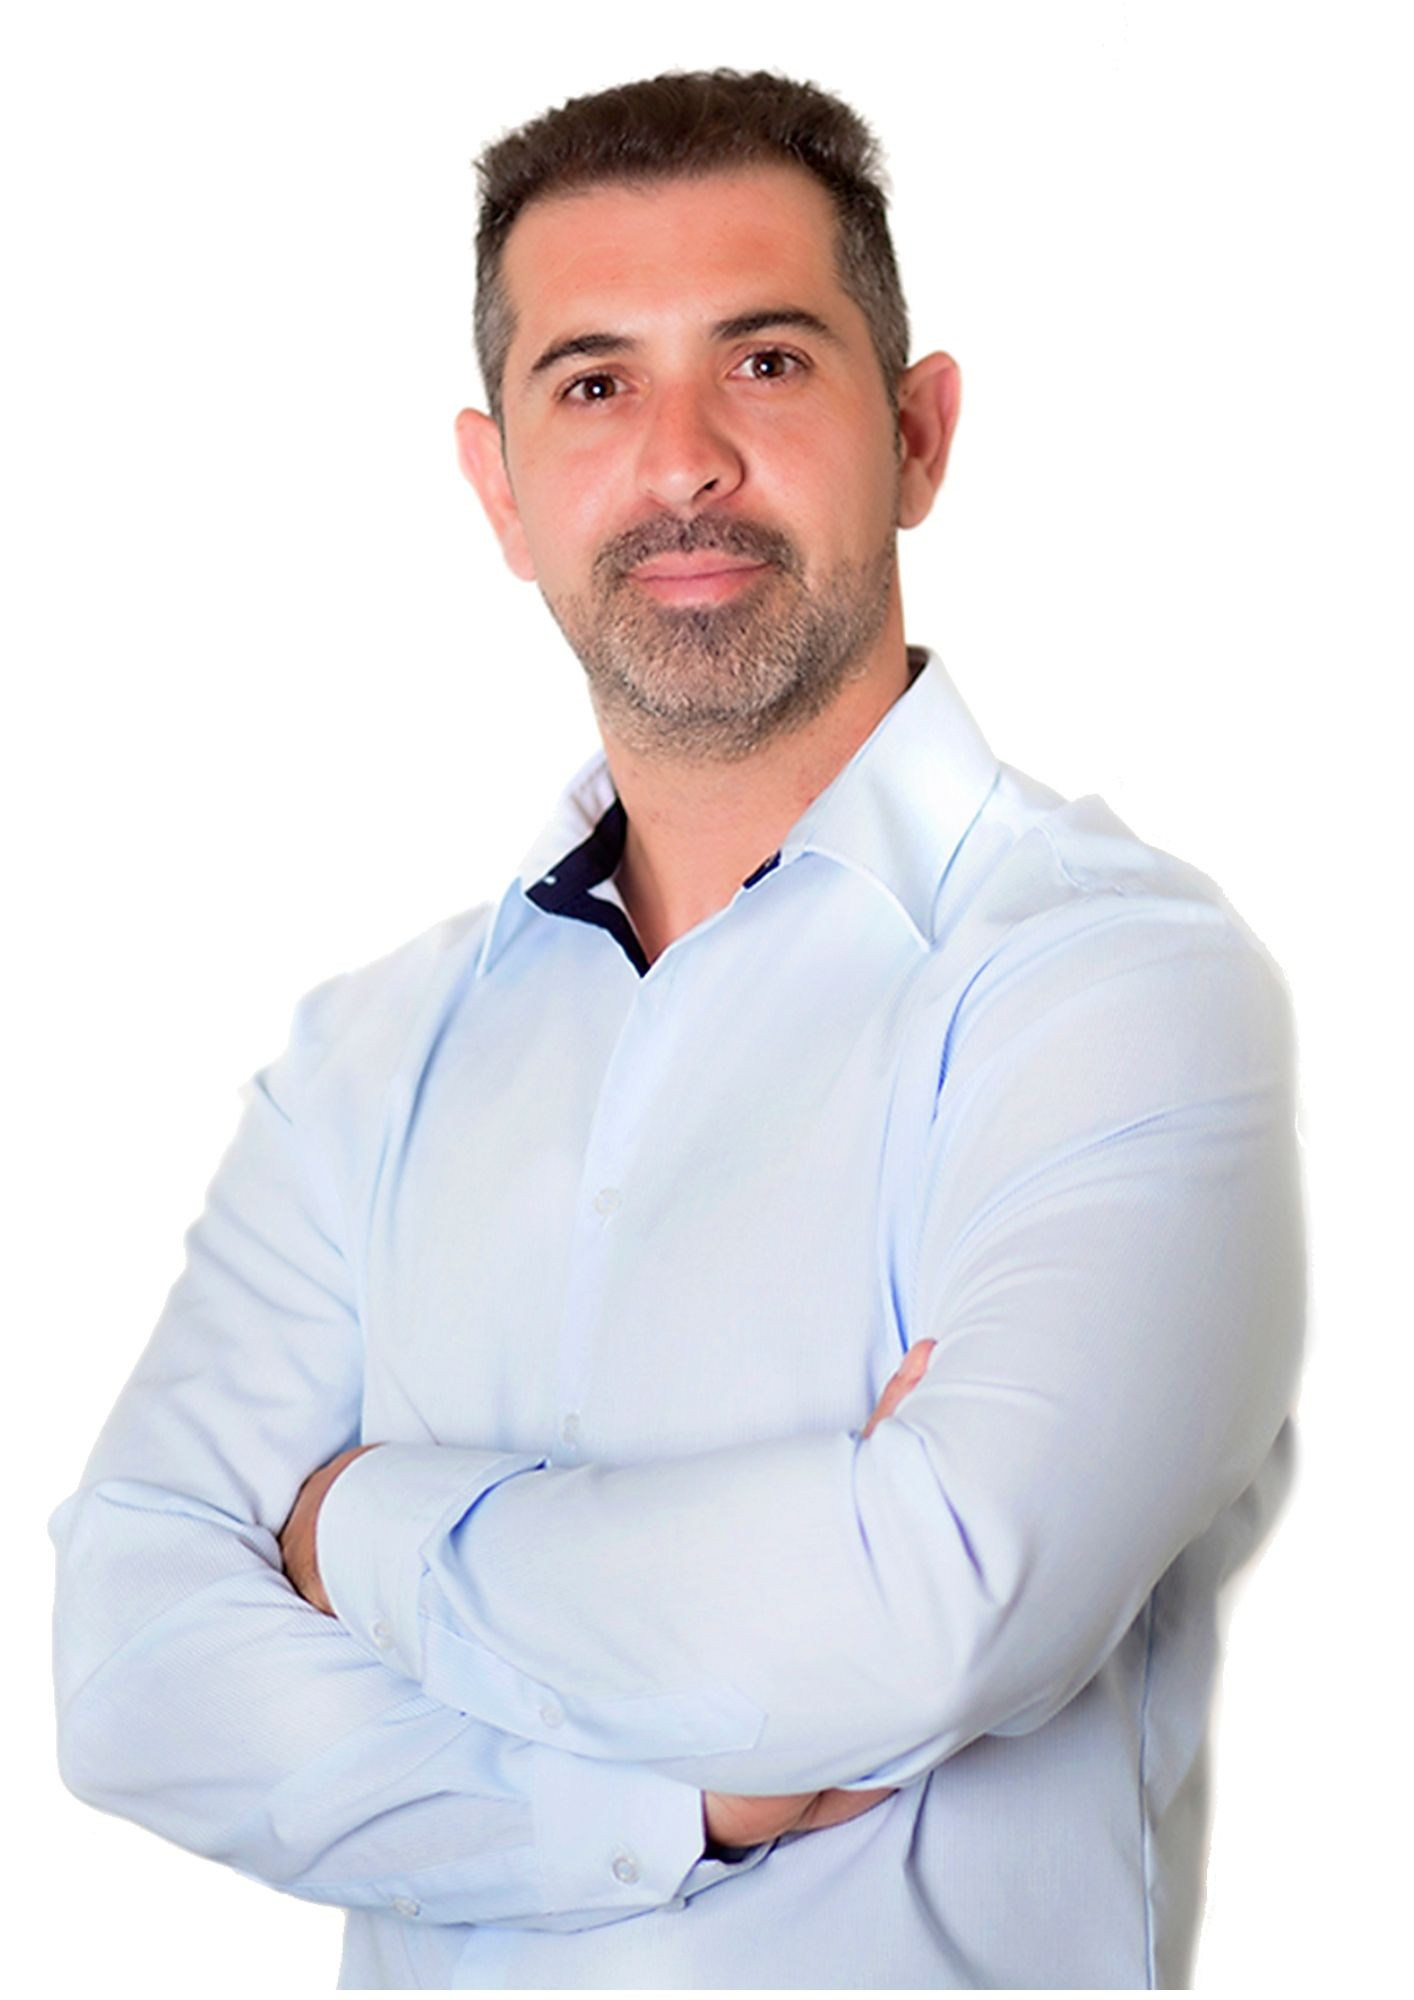 Javier Guiot Bermudo